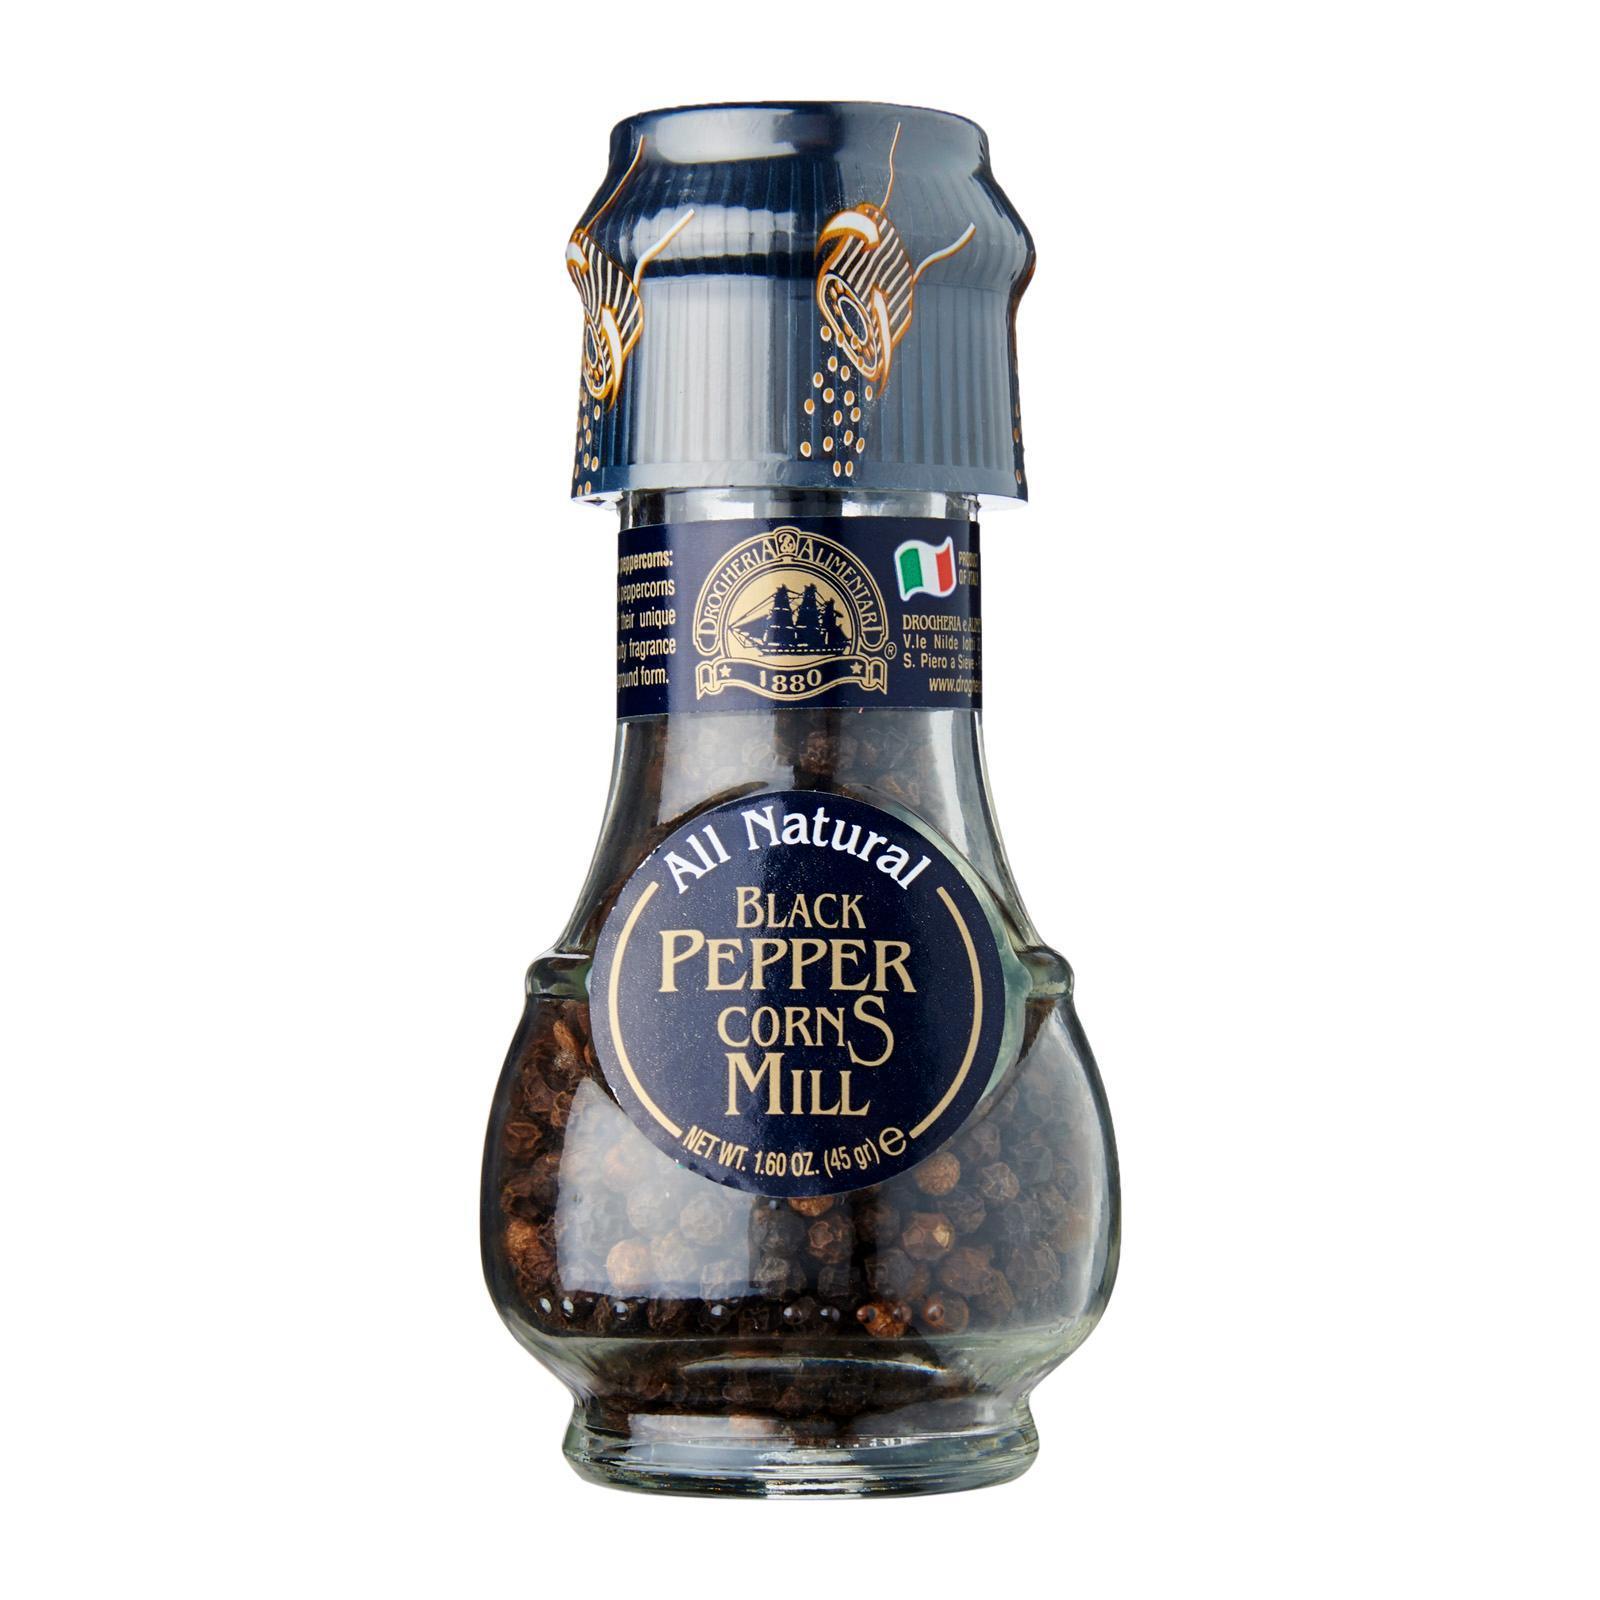 Drogheria & Alimentari All Natural Black Pepper Corns Mill